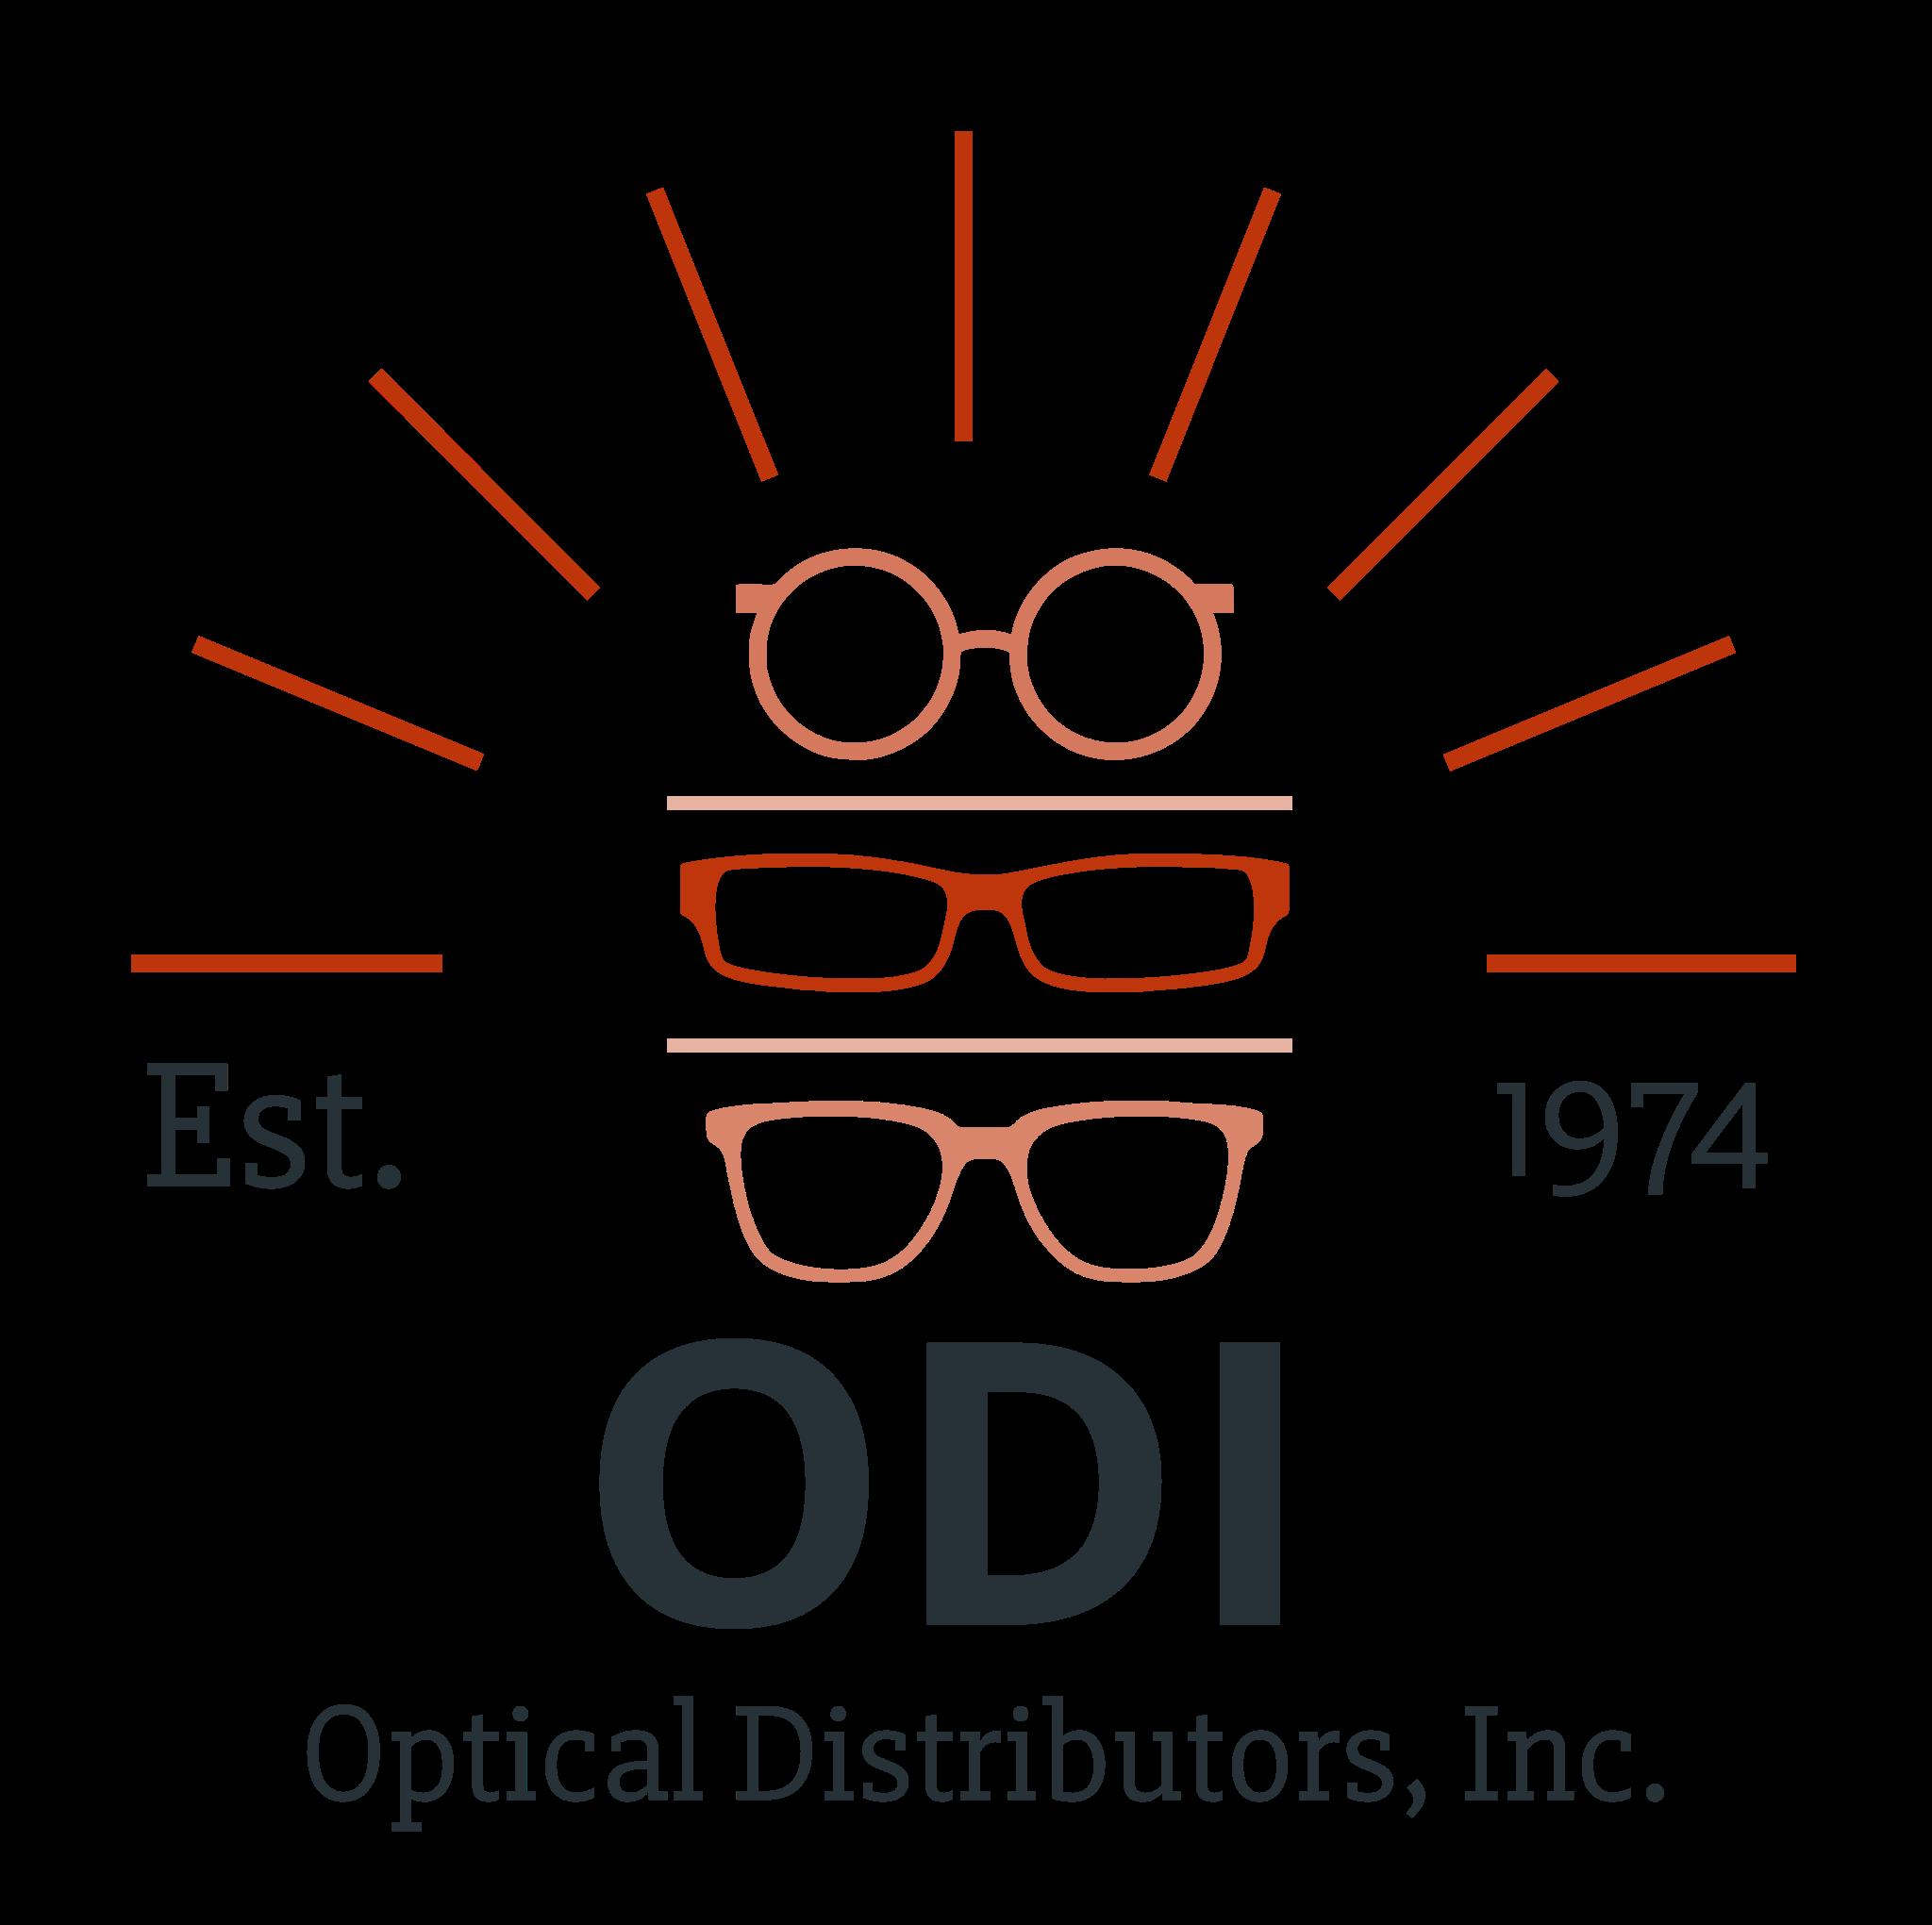 Welcome to Optical Distributors, Inc.